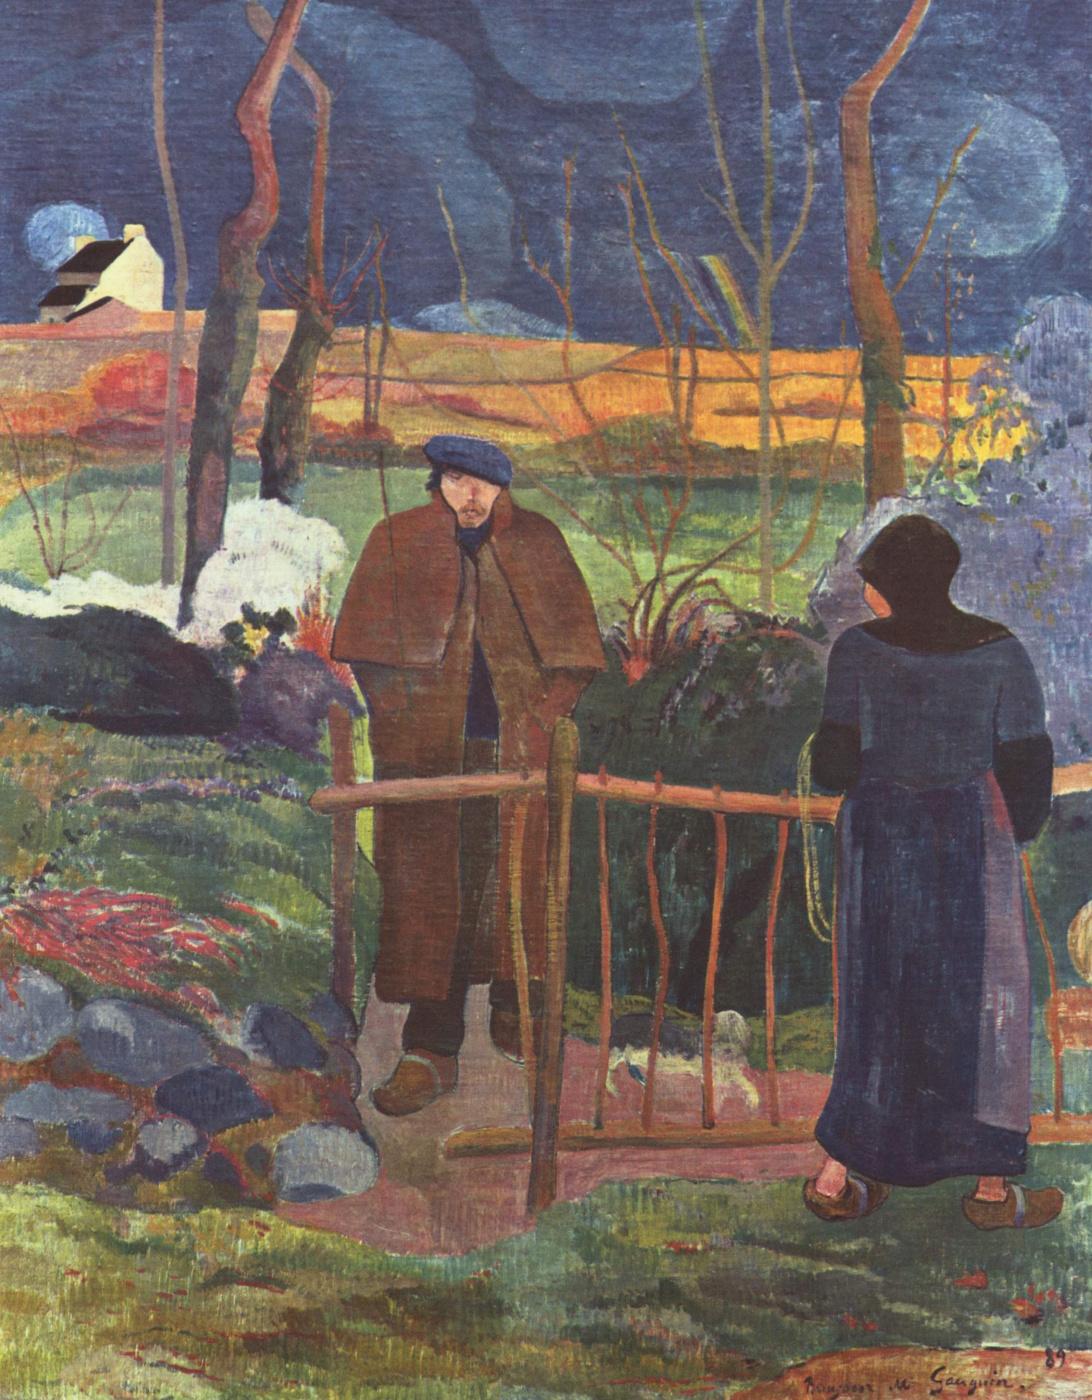 Paul Gauguin. Good morning, Mr. Gauguin!